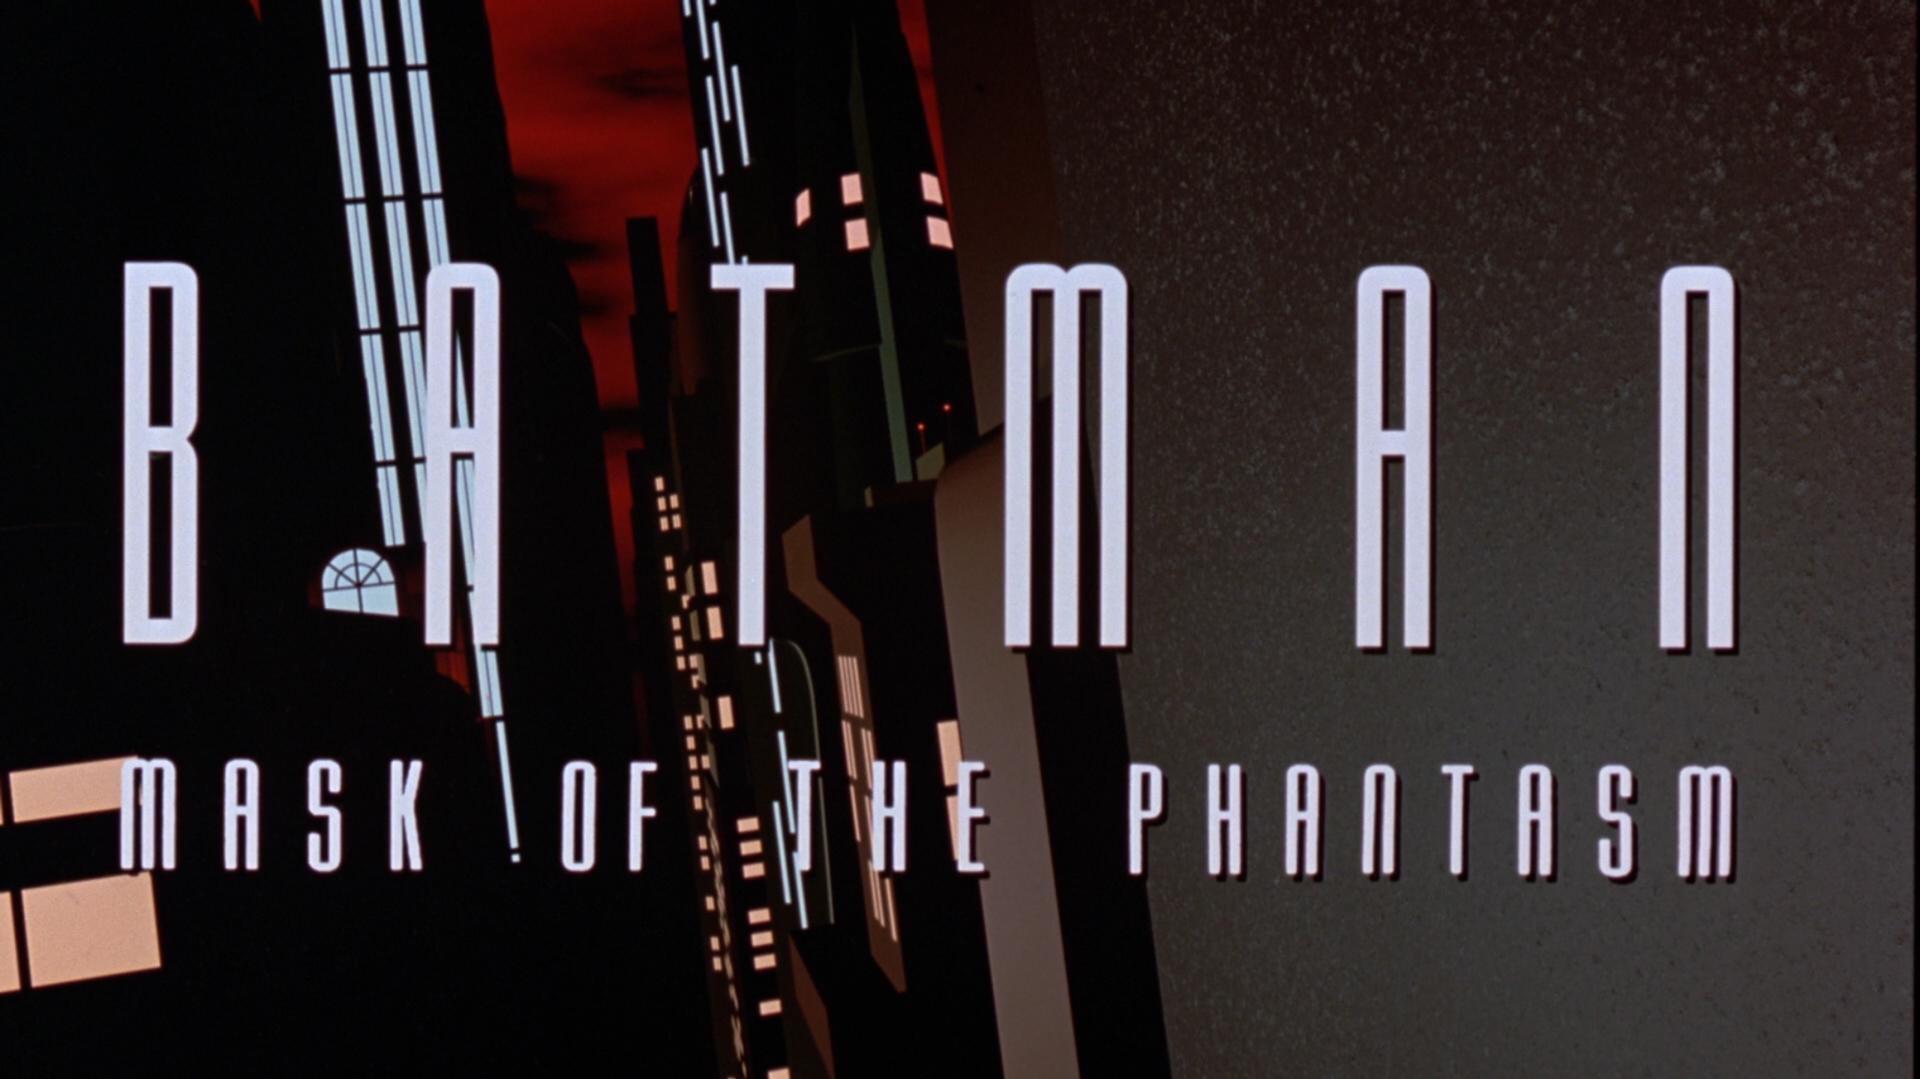 Batman: Mask of the Phantasm Blu-ray Title Wide